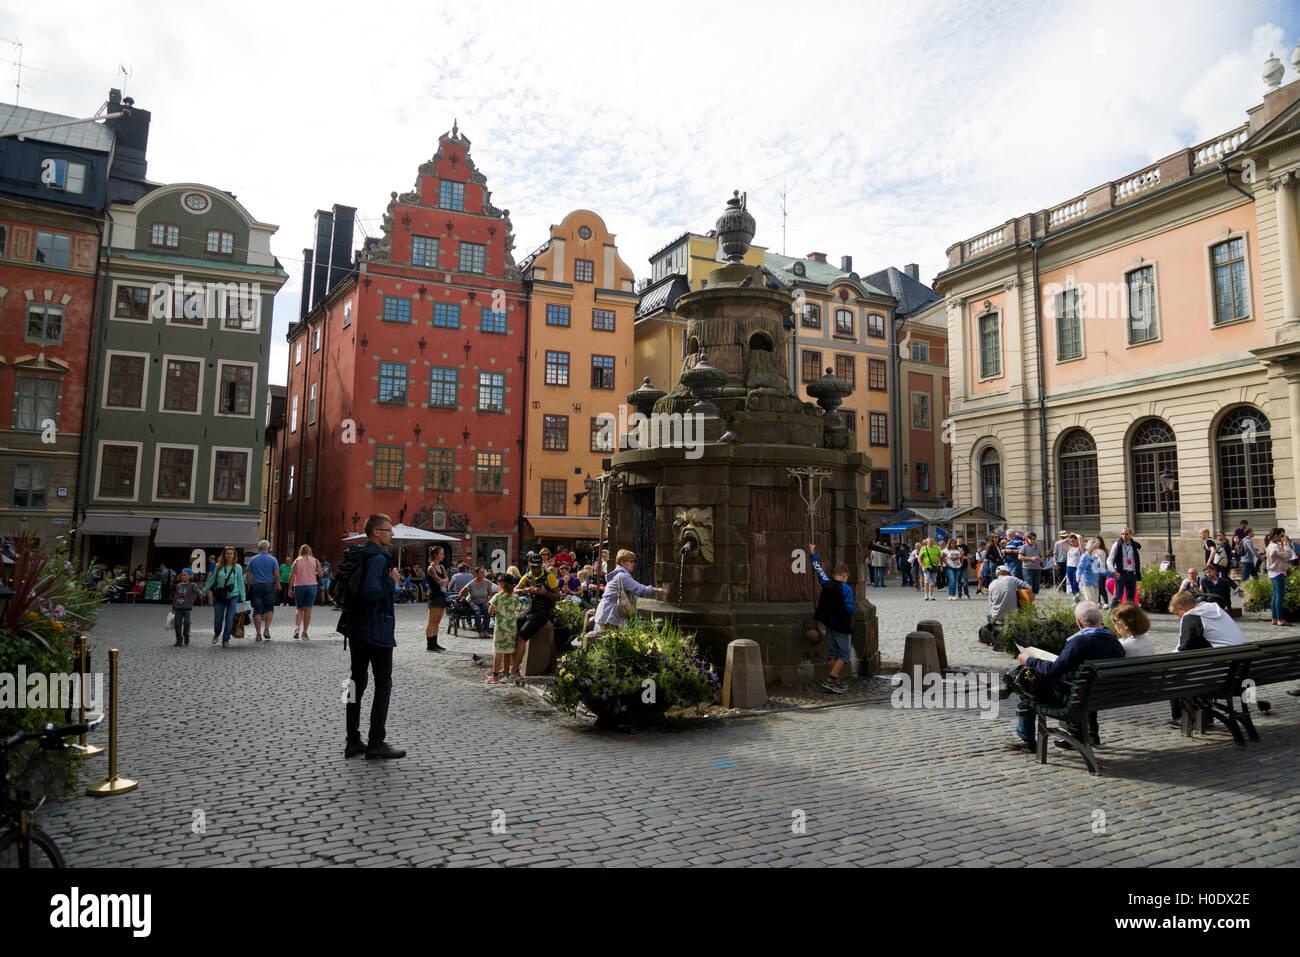 Stortorget, Gamla Stan, Stockholm, Sweden. - Stock Image